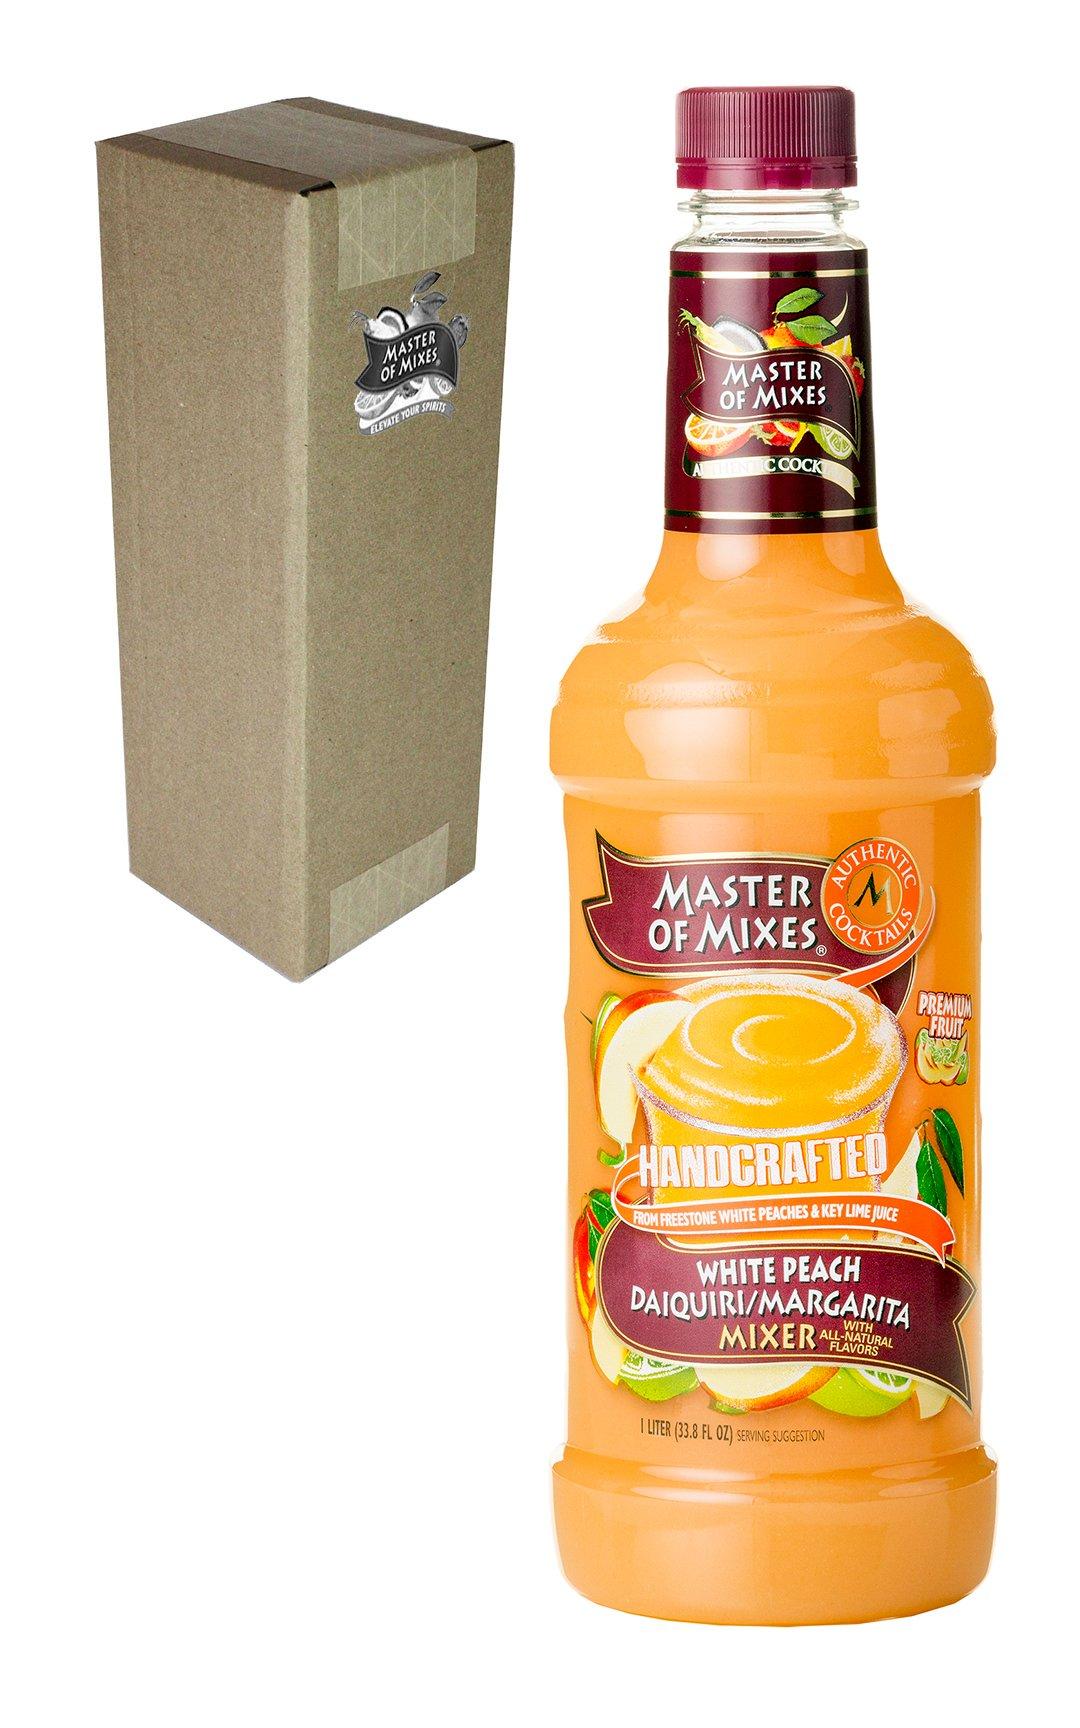 Master of Mixes White Peach Daiquiri/Margarita Drink Mix, Ready To Use, 1 Liter Bottle (33.8 Fl Oz), Individually Boxed